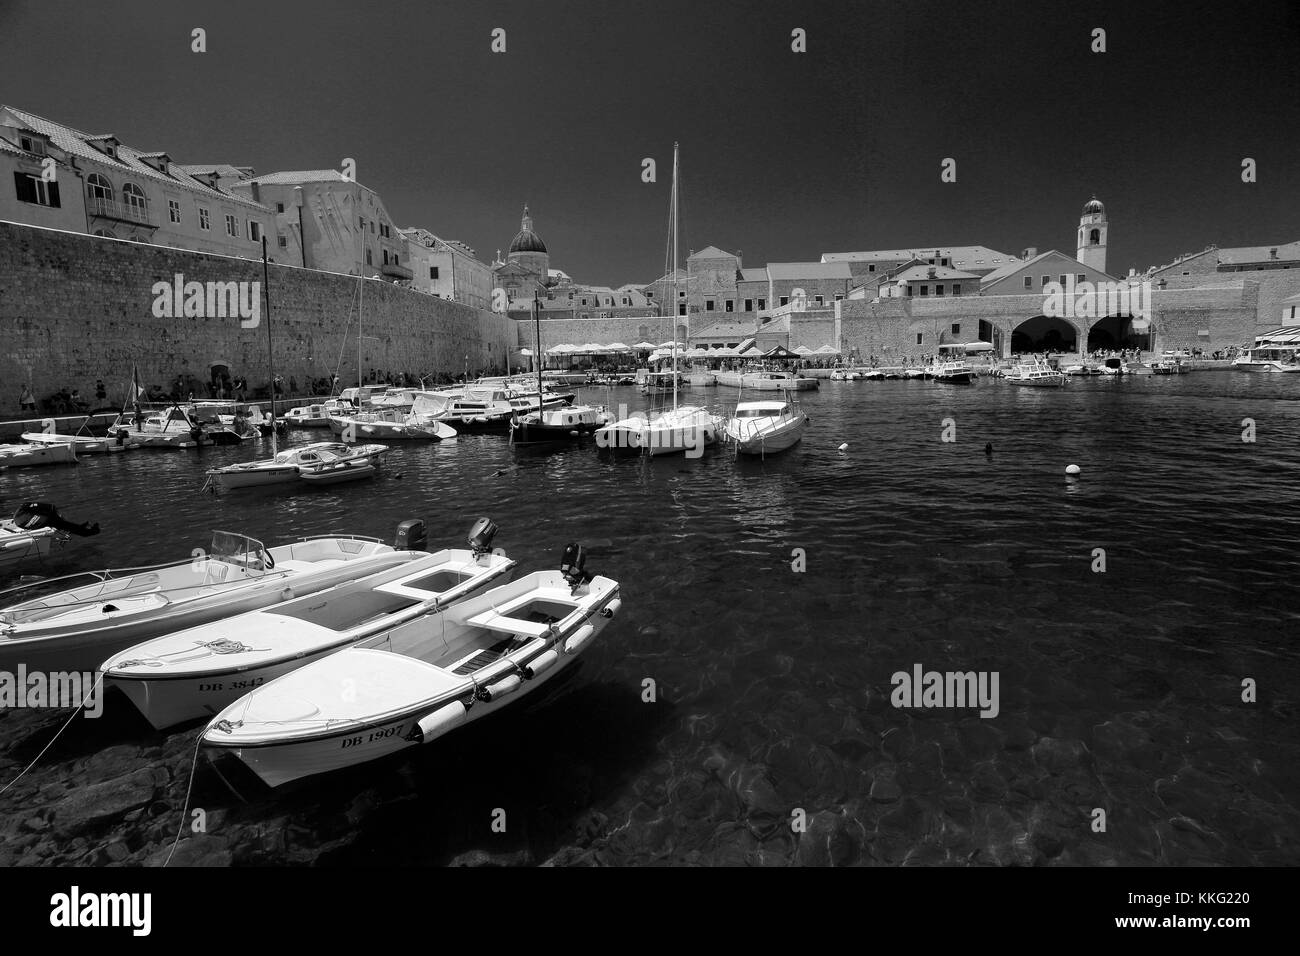 Summer, boats in the Old Port of Dubrovnik, Dubrovnik-Neretva County, Dalmatian coast, Adriatic Sea, Croatia, Balkans, - Stock Image